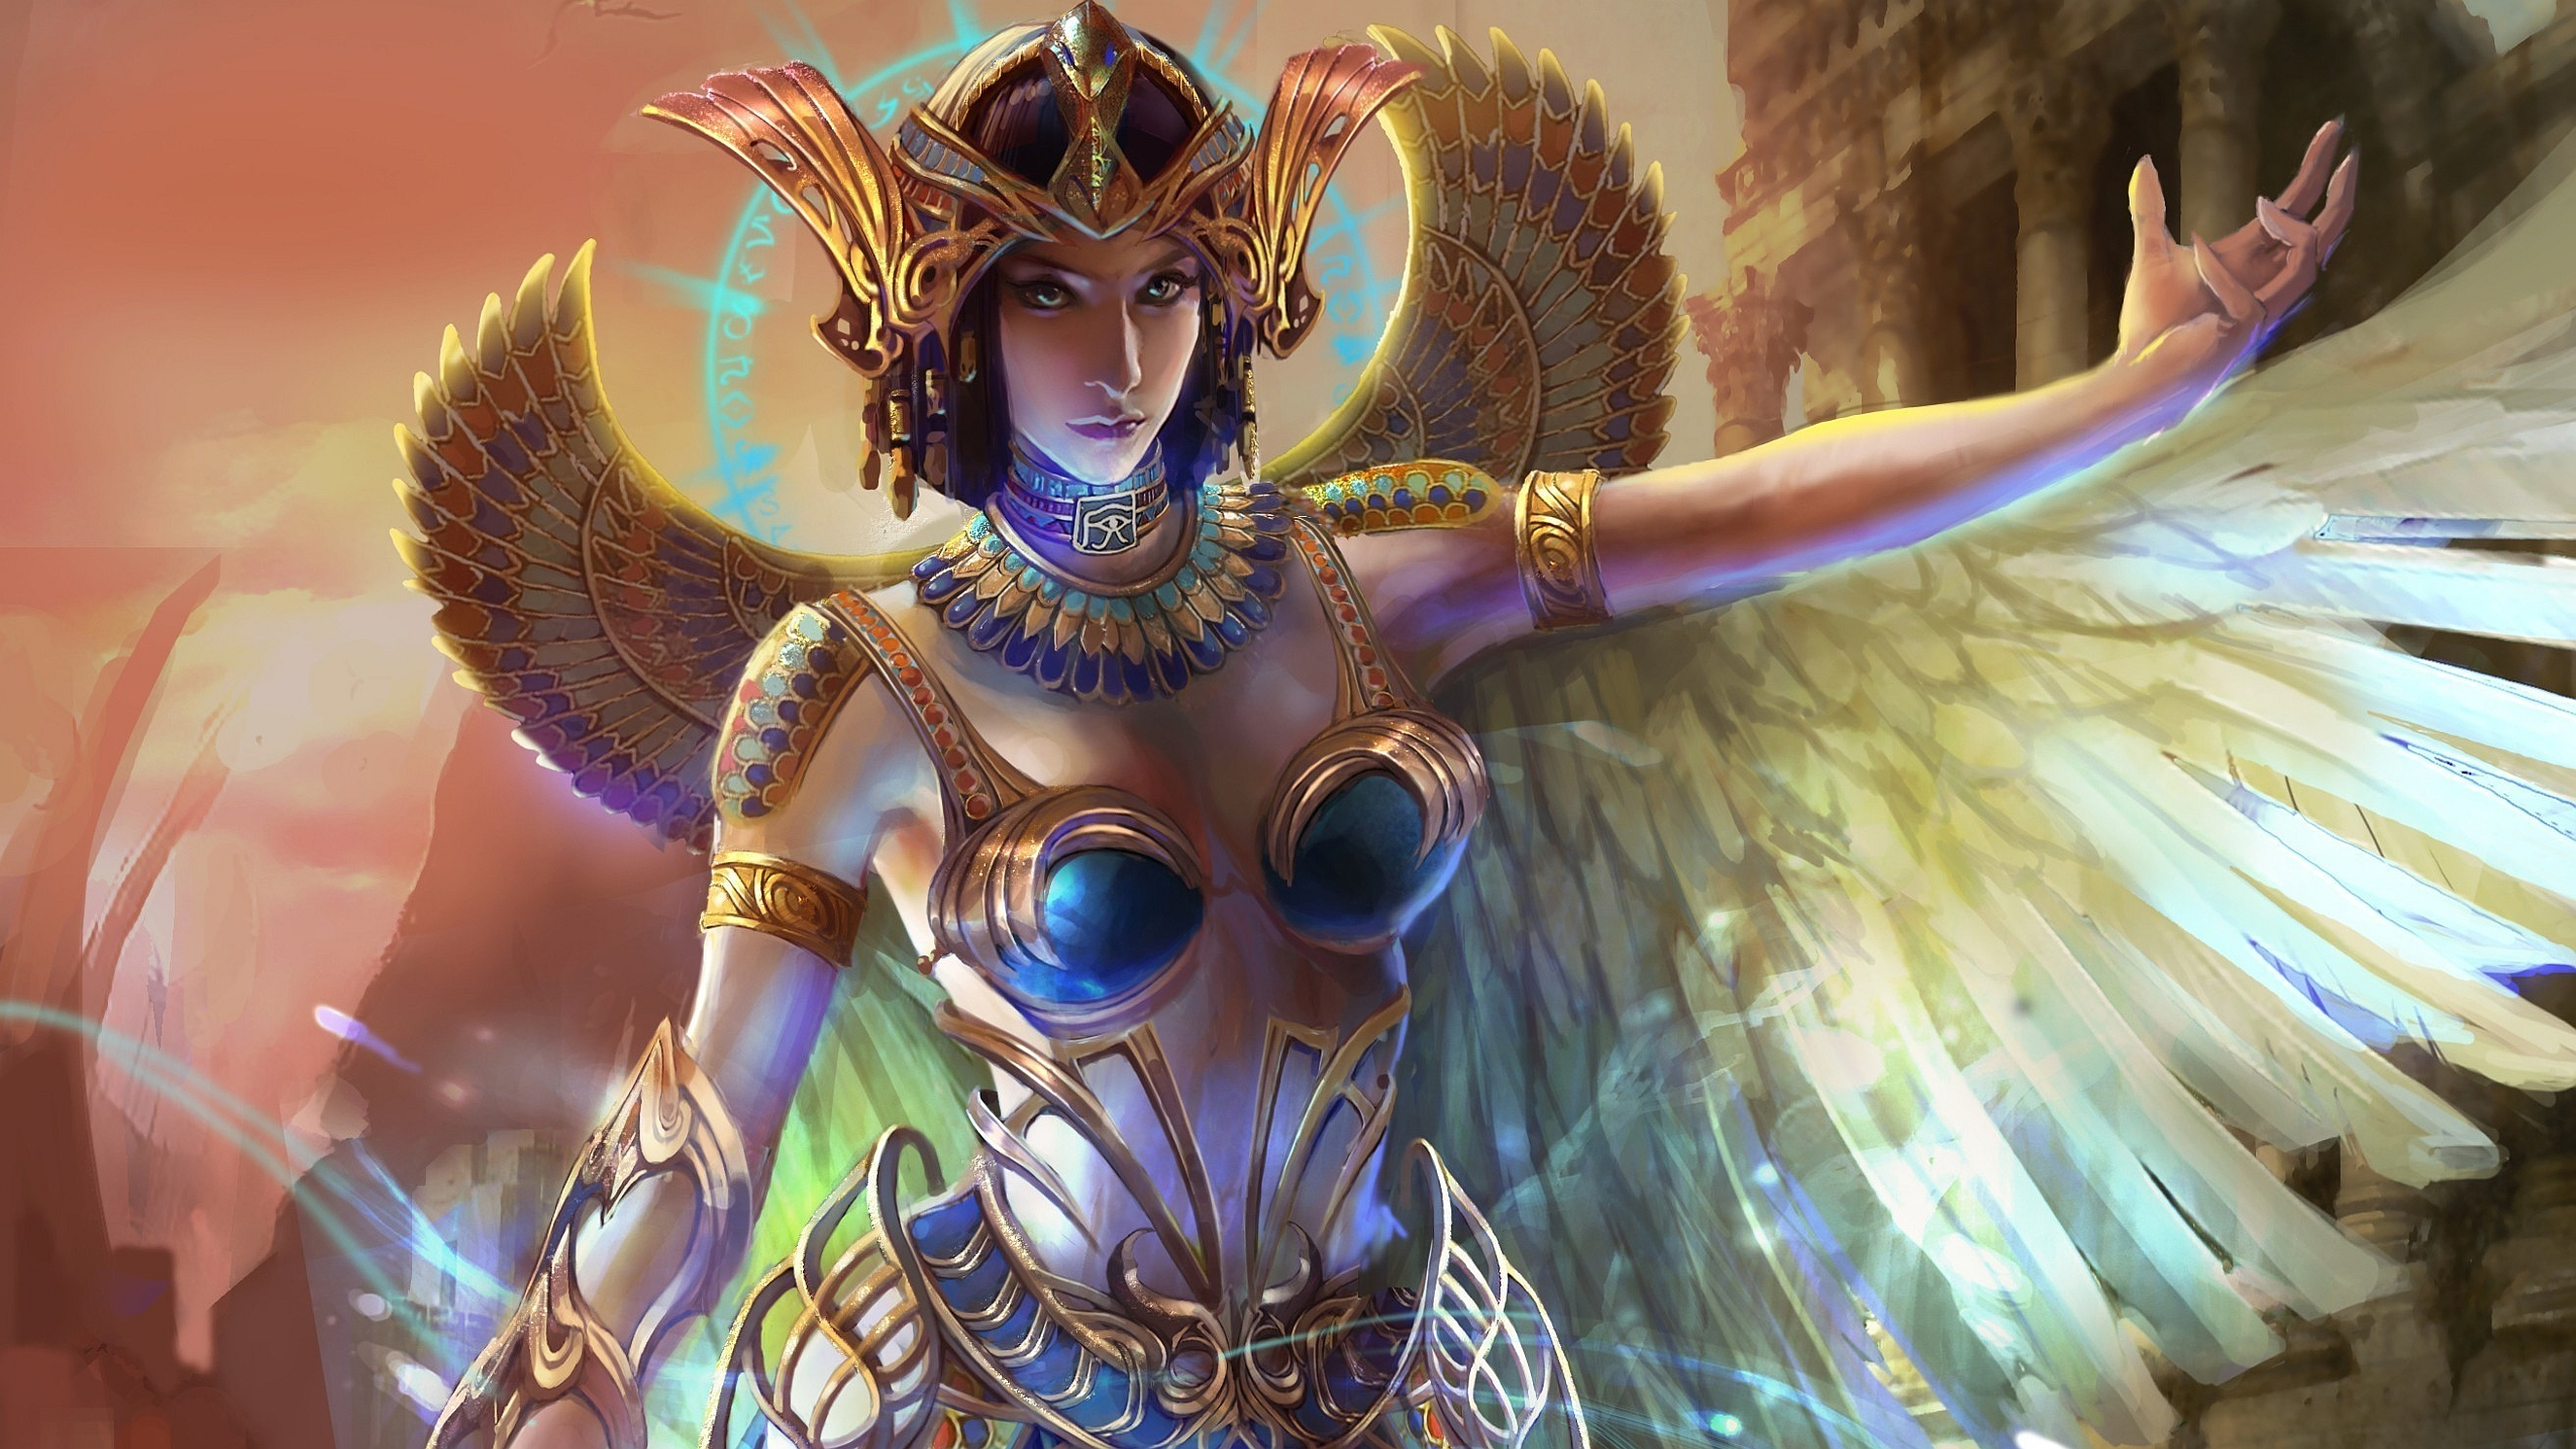 Rihanna Iphone Wallpaper Hd Isis Hd Wallpaper Background Image 2650x1491 Id